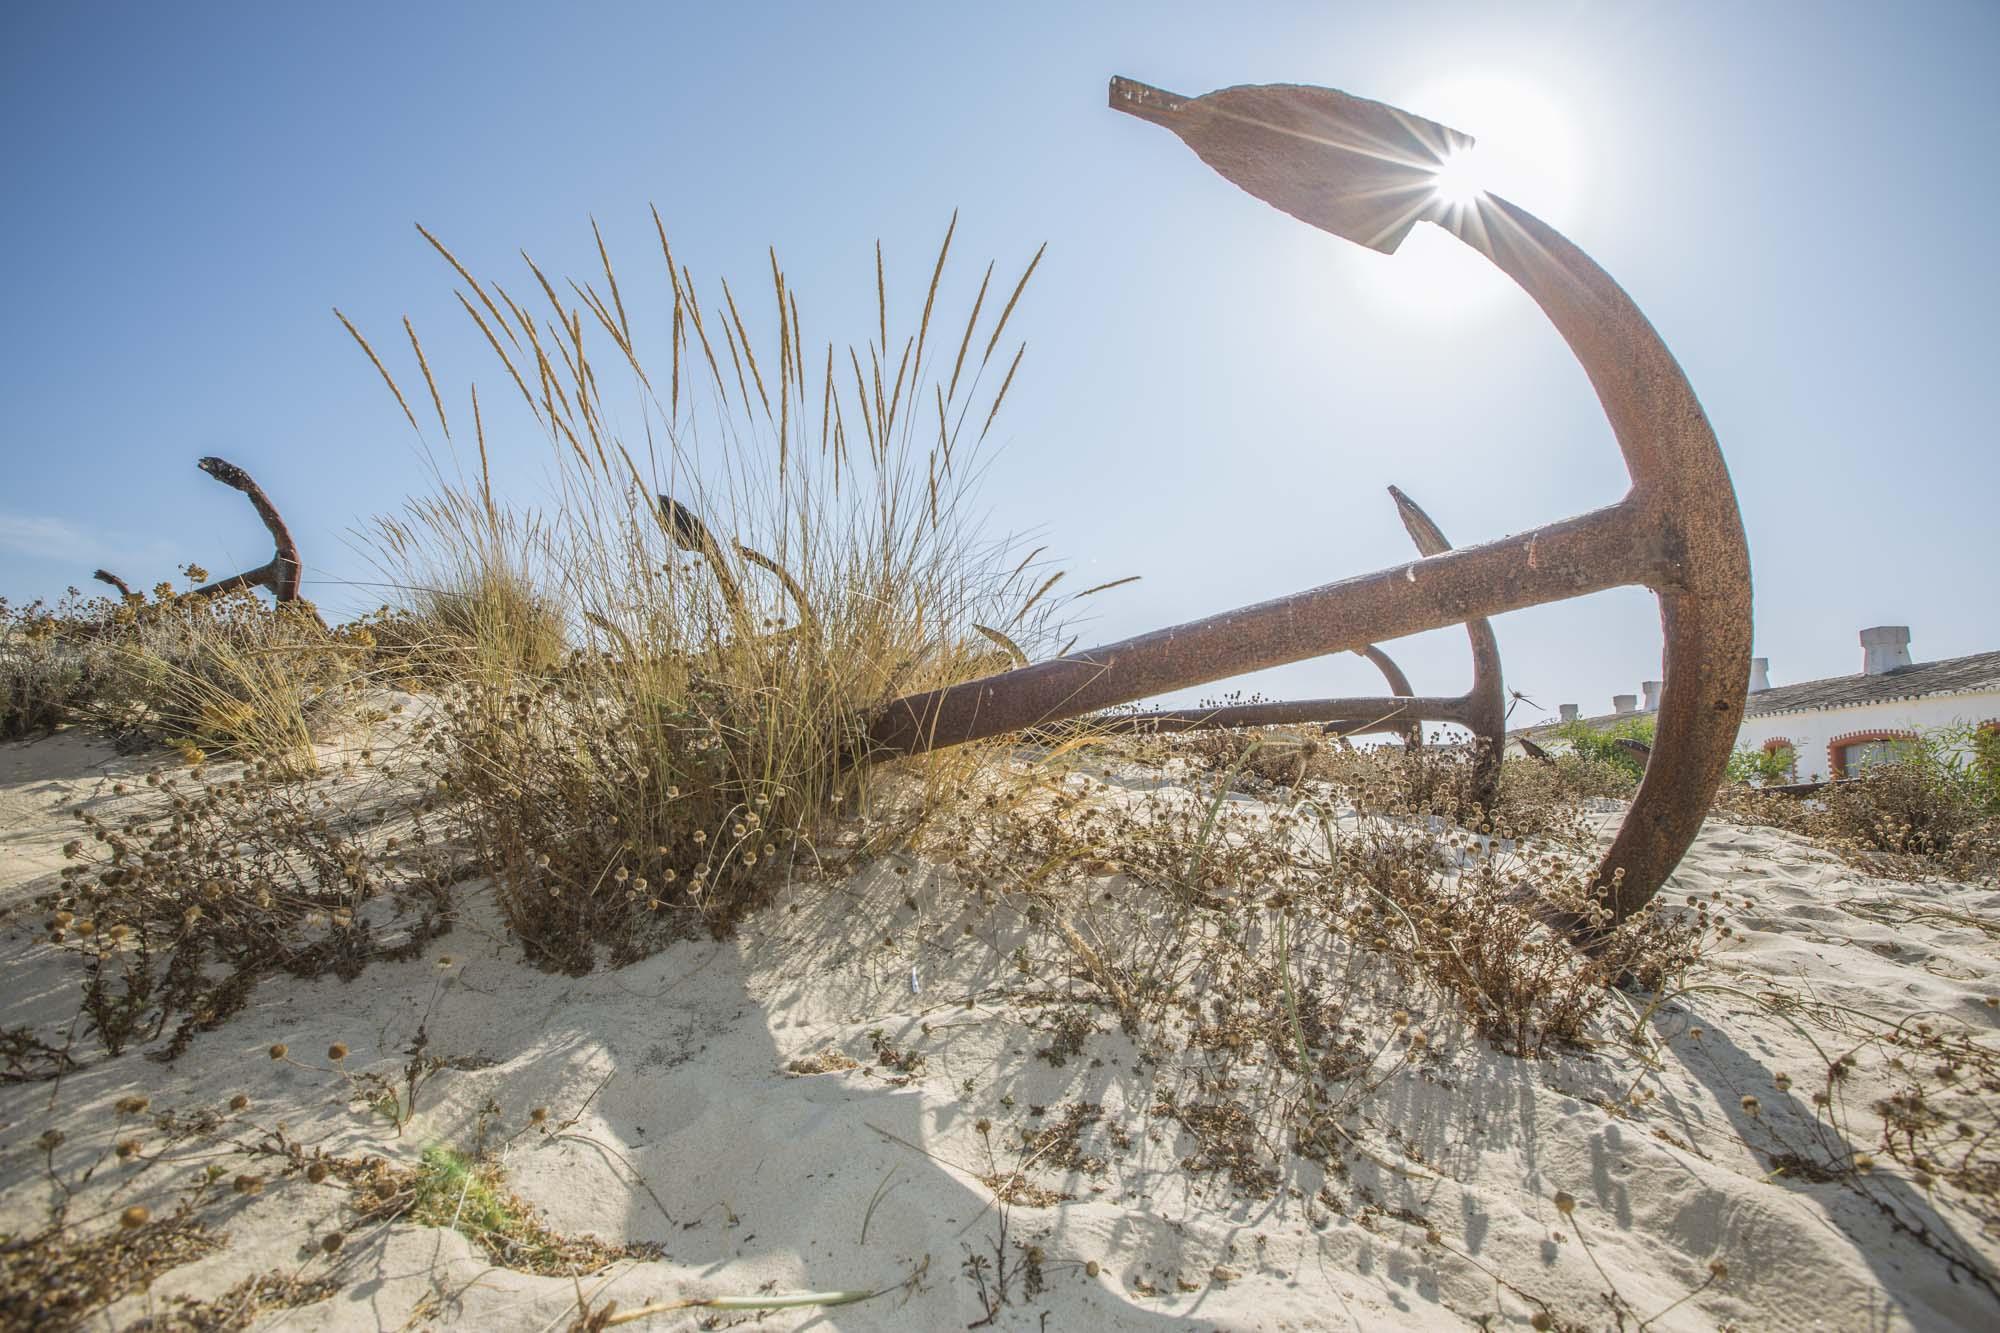 Portugal, Algarve, Tavira, Praia do Barril Ankerfriedhof der ehemaligen Thunfischfalle